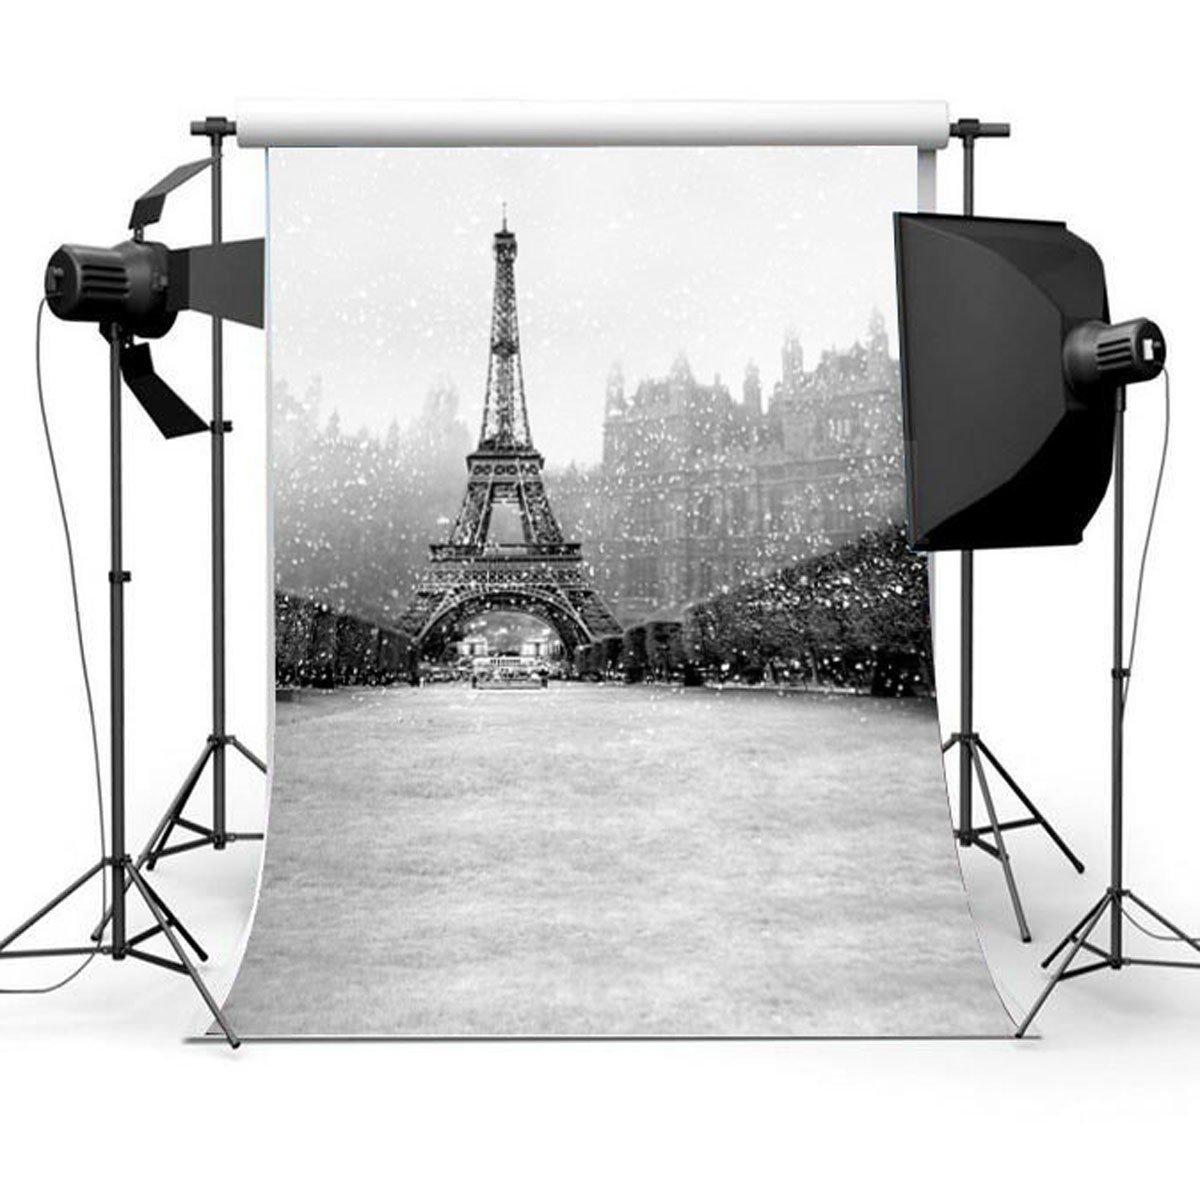 3x5FT Snow Eiffel Tower Photography Backdrops Studio Photo Background Vinyl Landscape